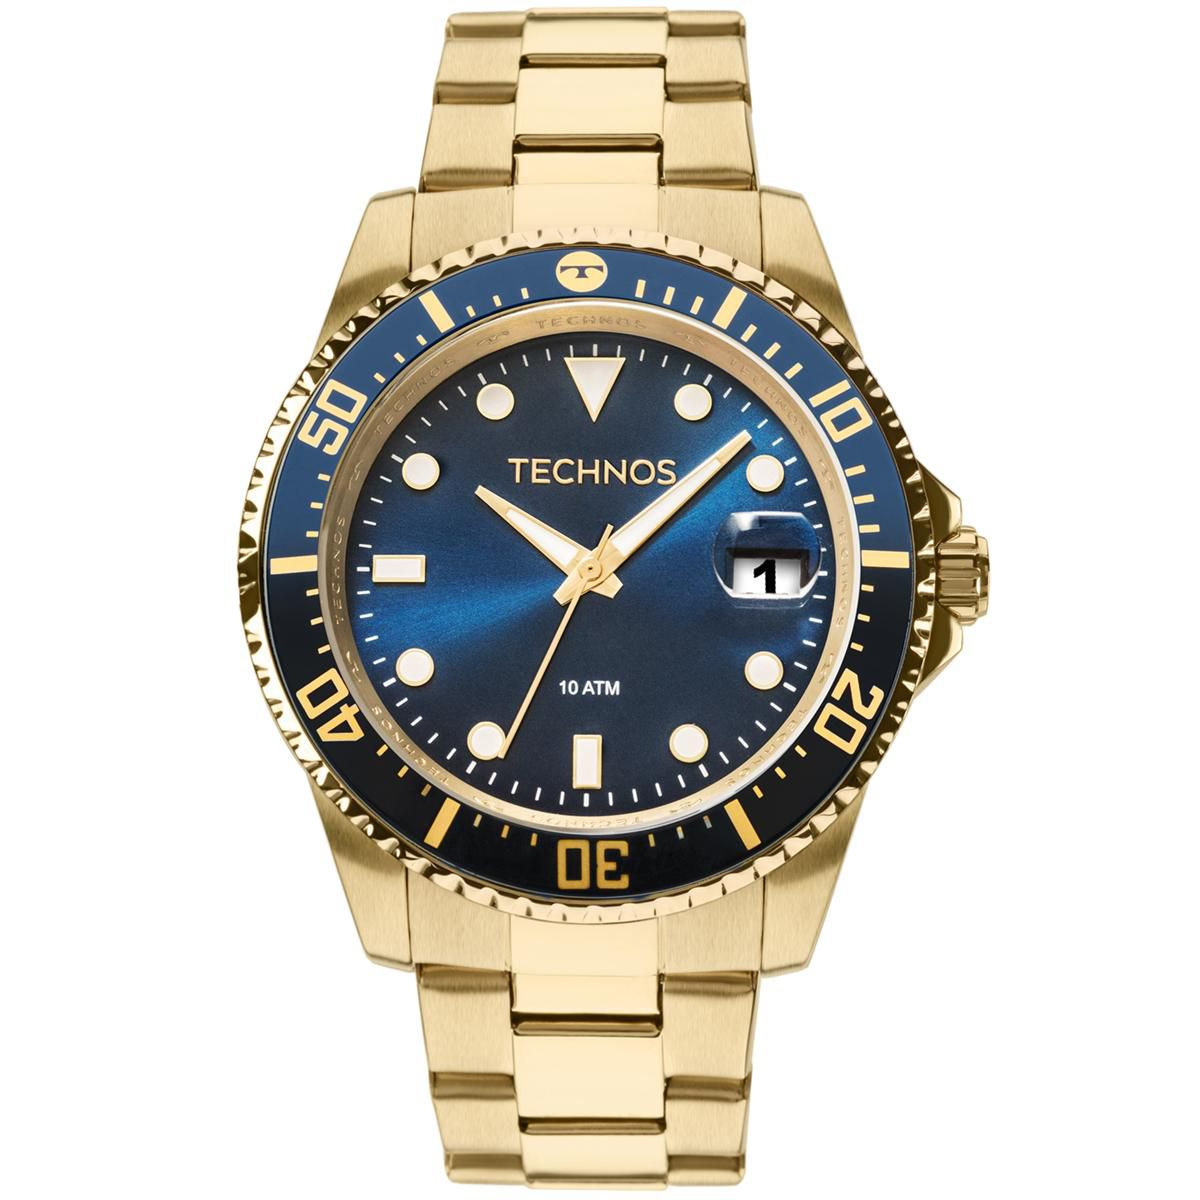 4ddaae1a1b0 Relógio Masculino Technos Skymaster 2415CK 4A 47mm Aço Dourado